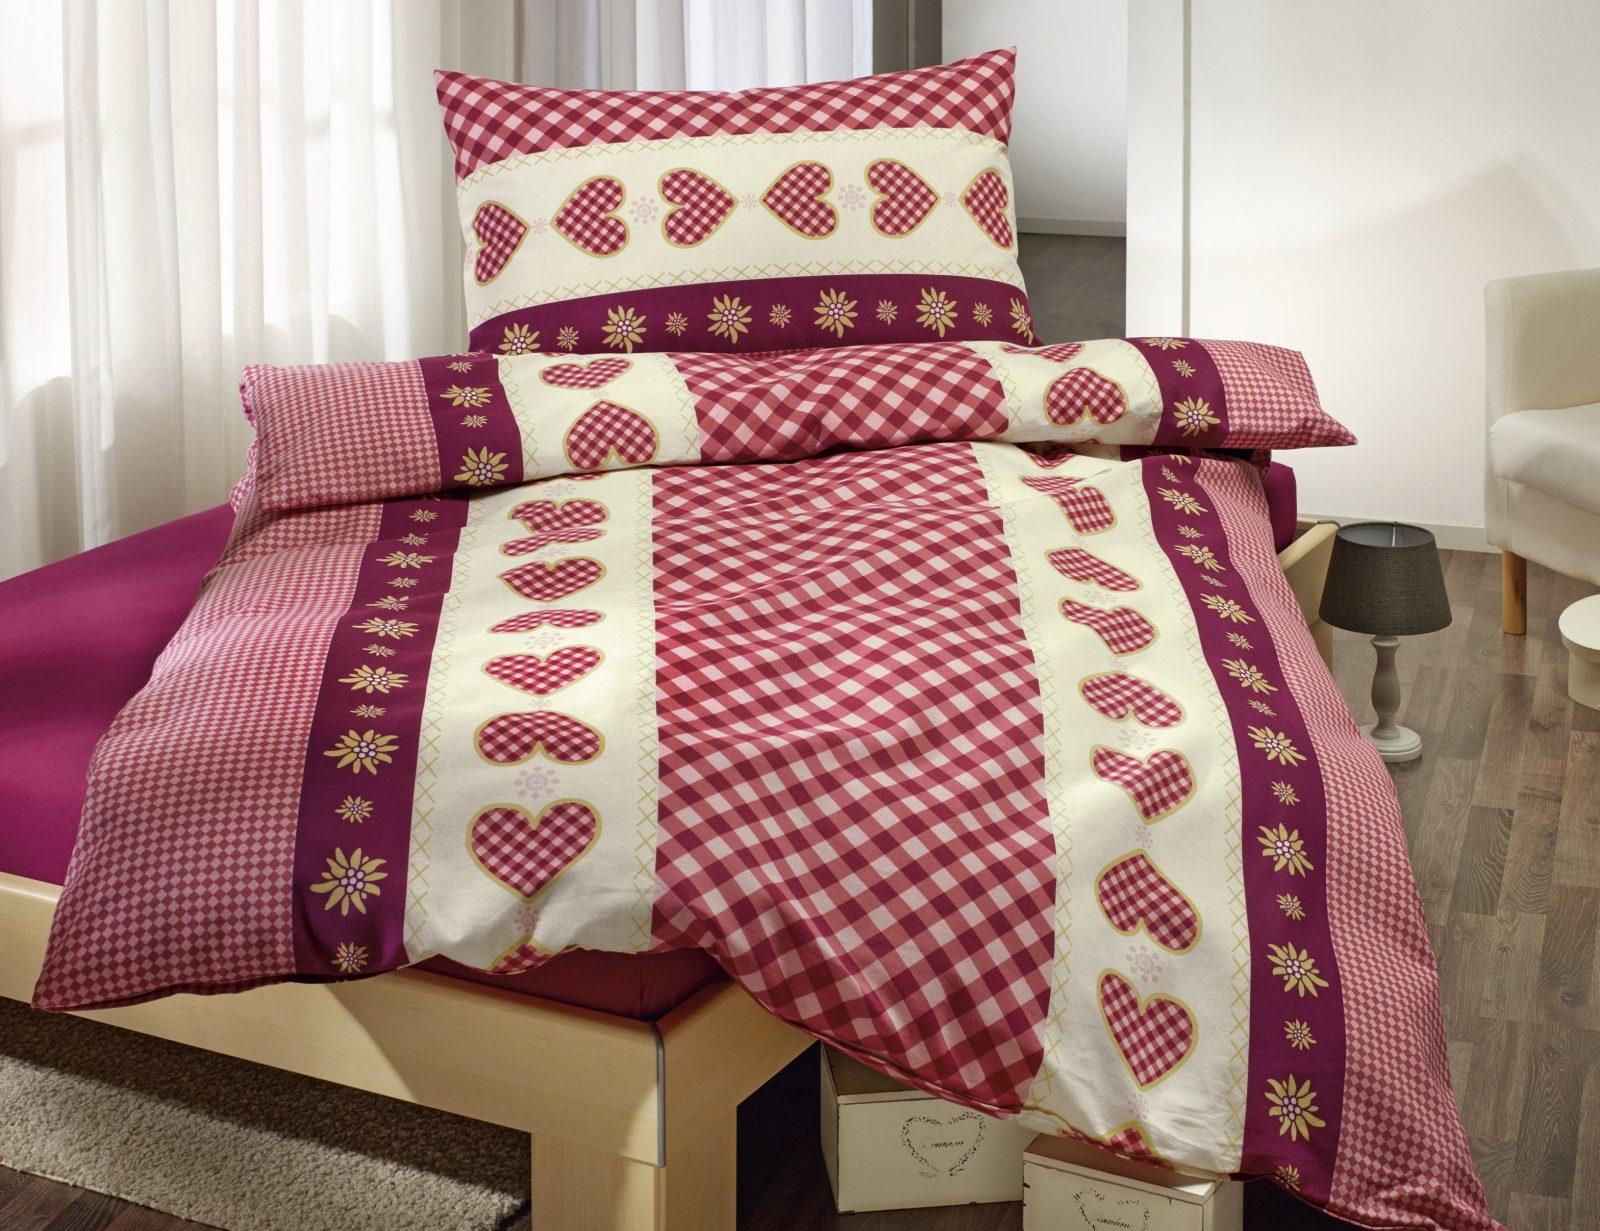 boss bettw sche outlet wohn kleiderschr nke stiftung. Black Bedroom Furniture Sets. Home Design Ideas